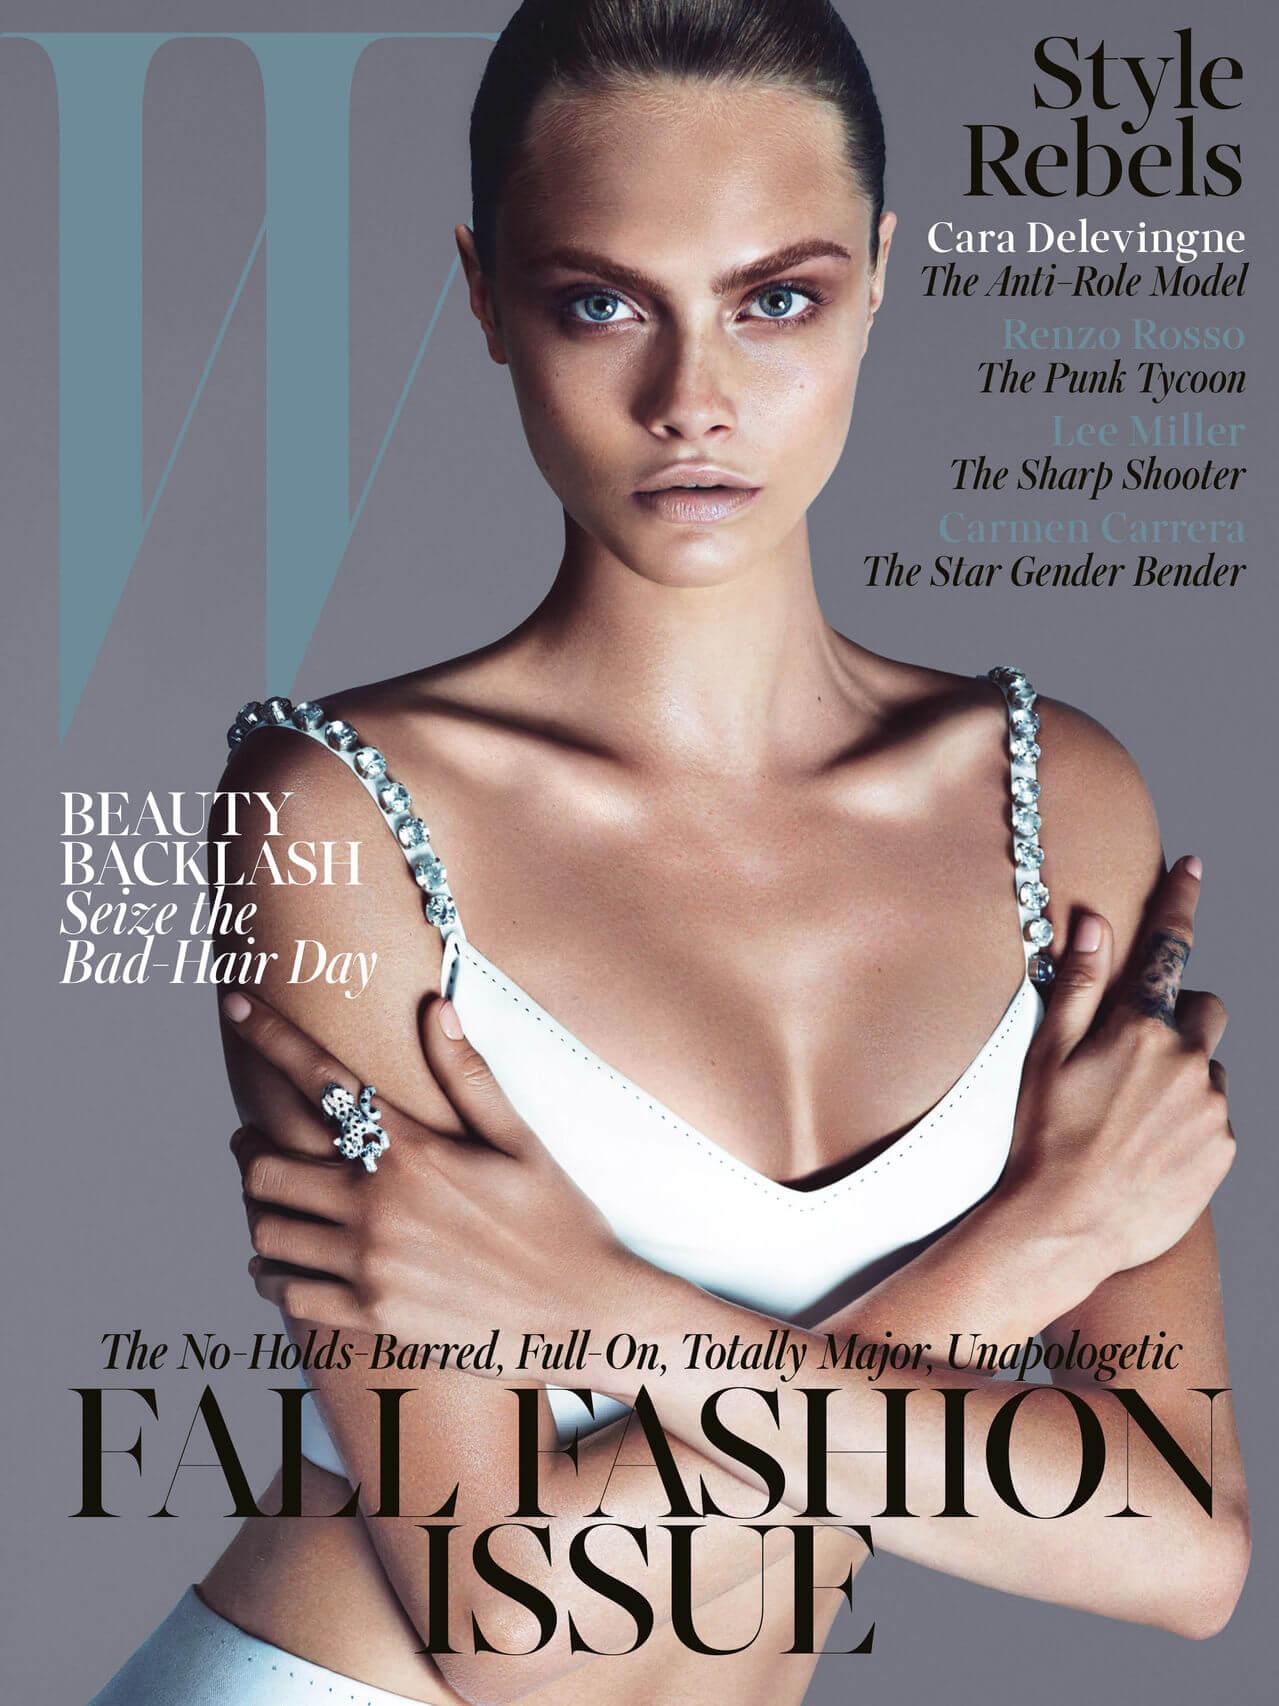 Cara Delevingne na capa da revista W de setembro 2013